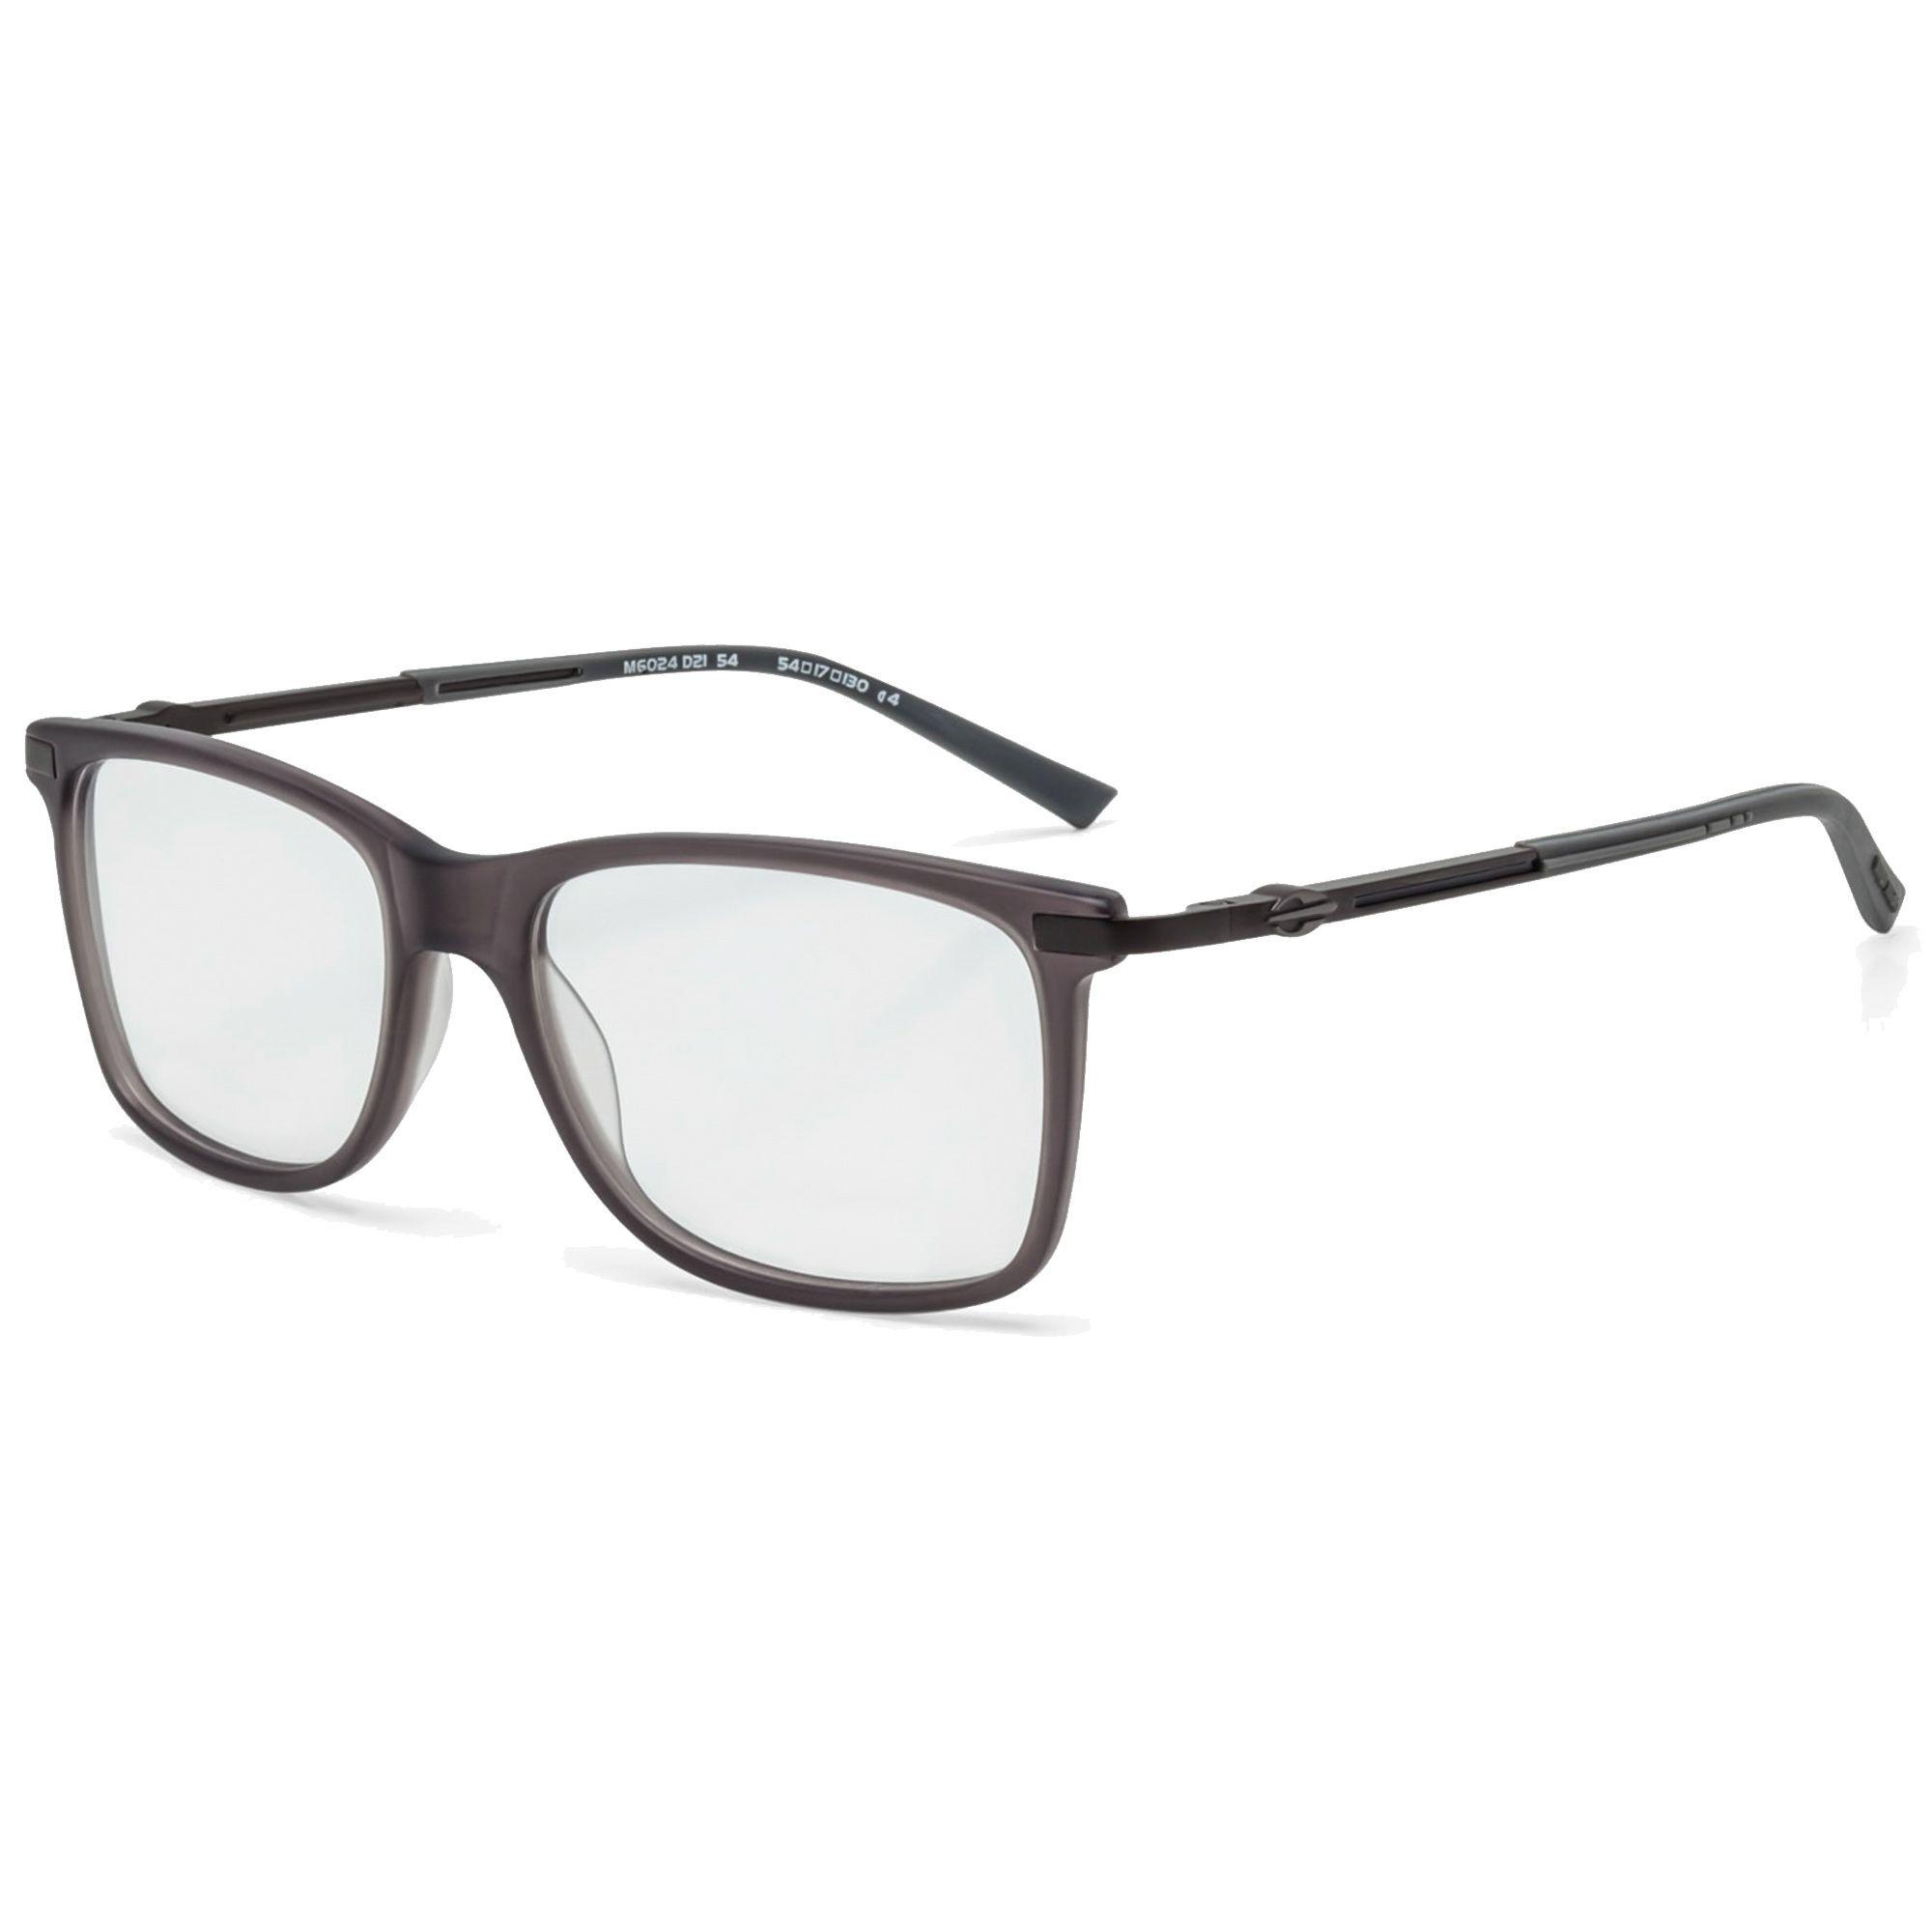 Óculos de Grau Unissex Mormaii M6024D2154